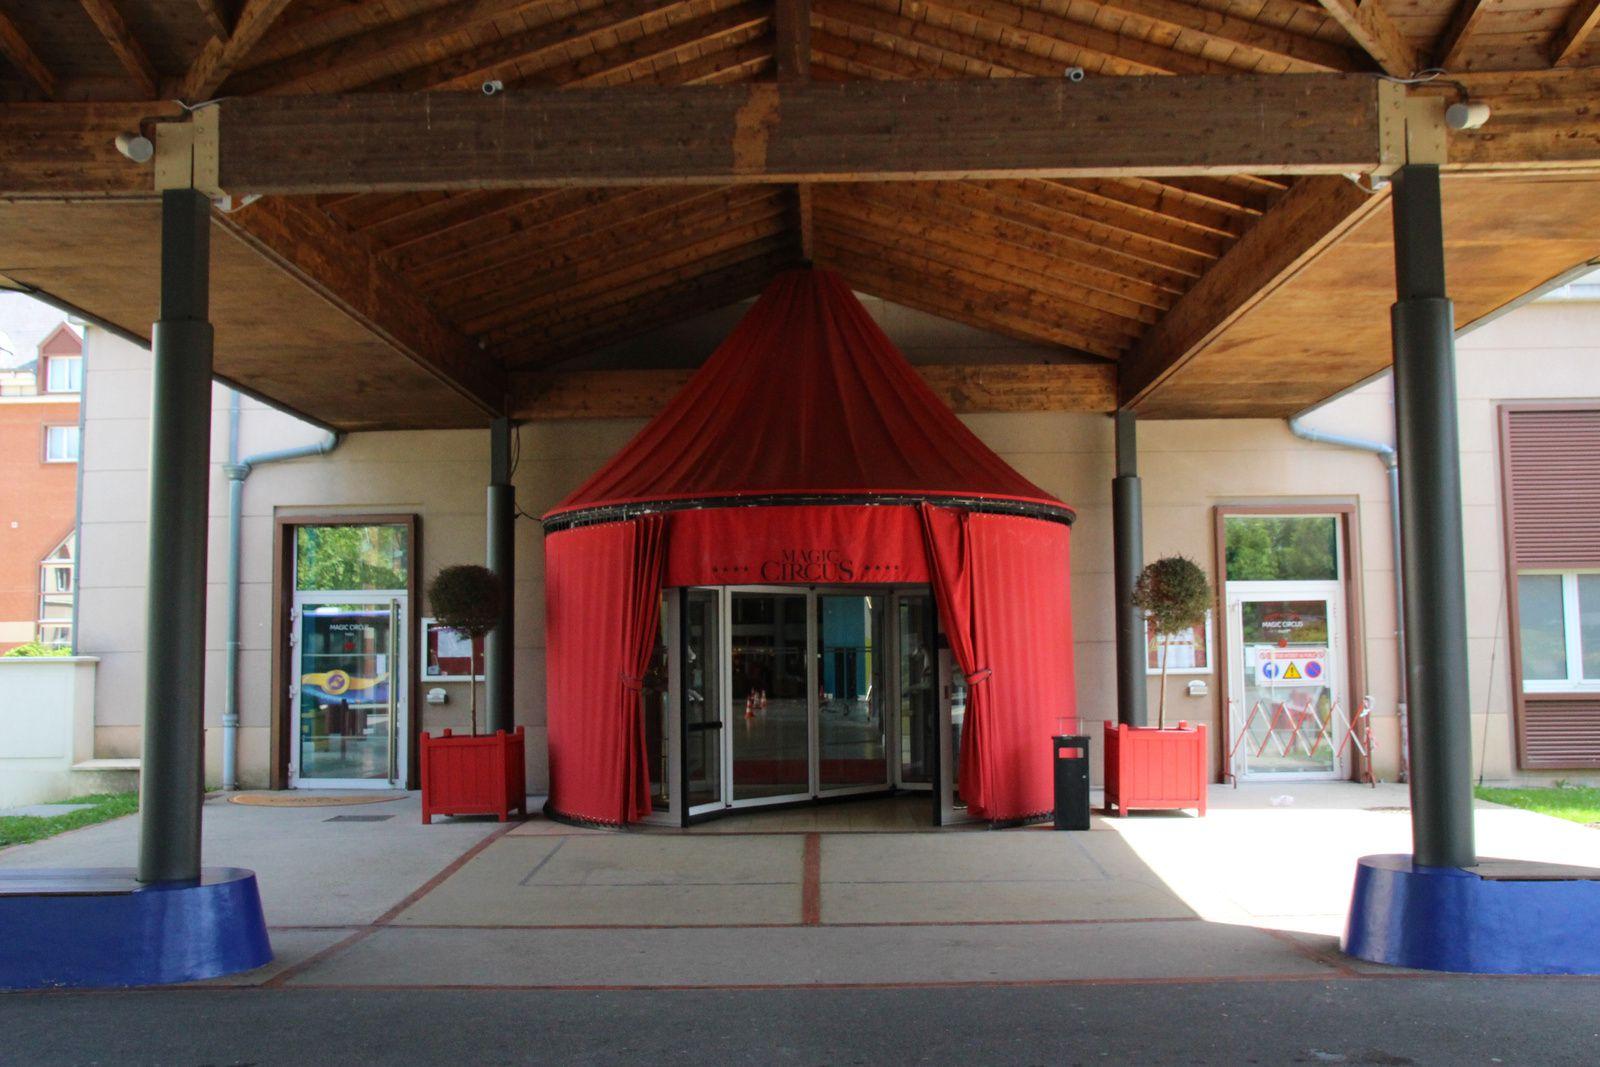 Salle De Bain Hotel Cheyenne Disney ~ l h tel magic circus partenaire de disneyland paris les